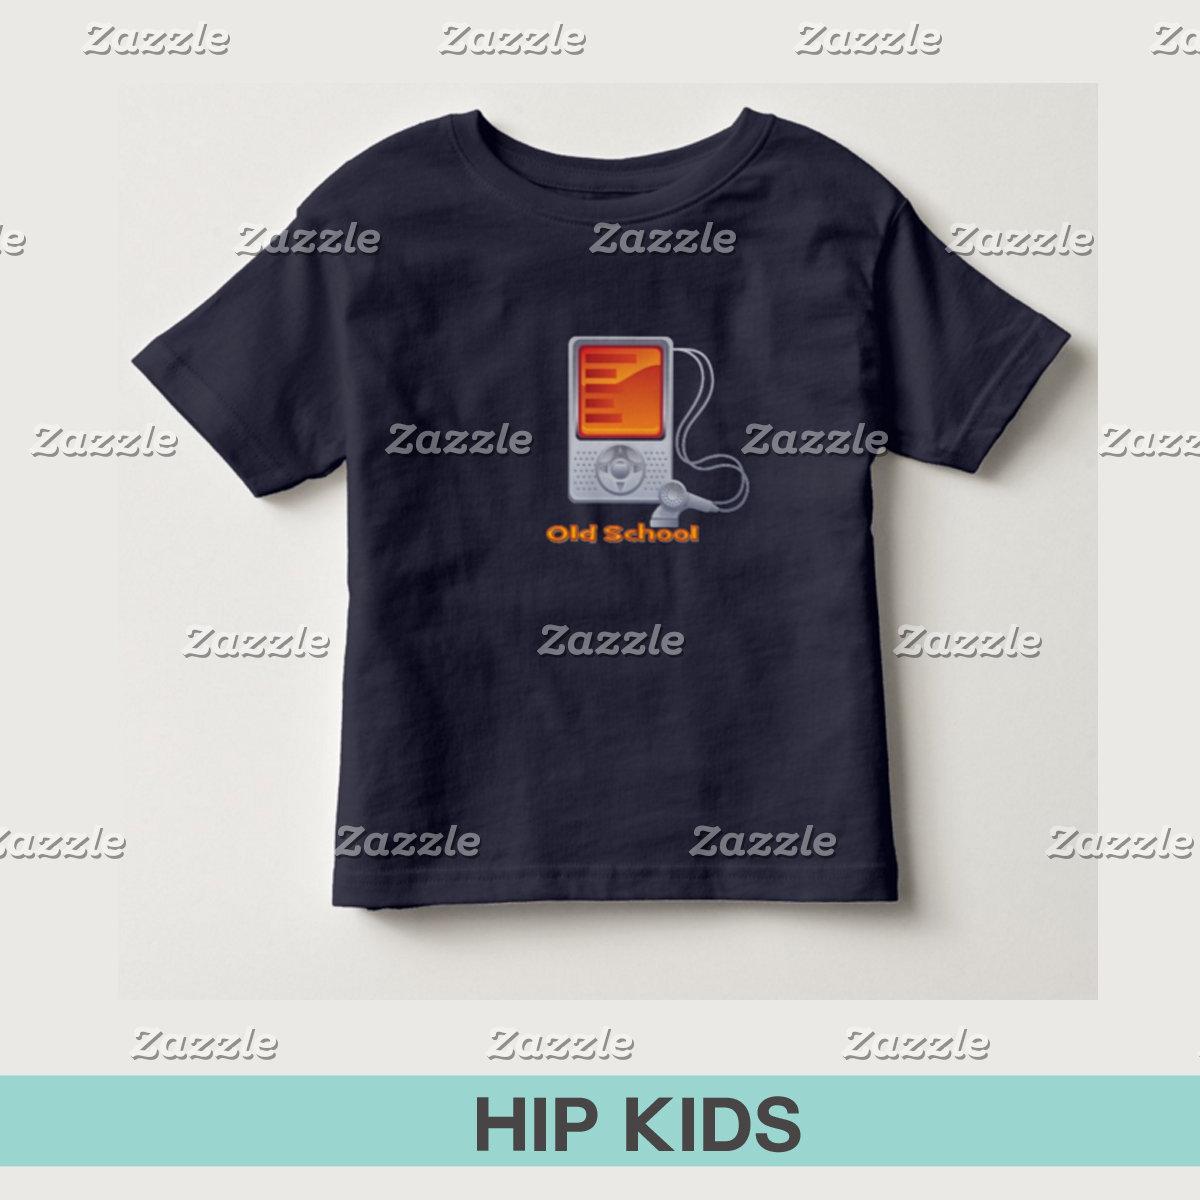 HIP KIDS